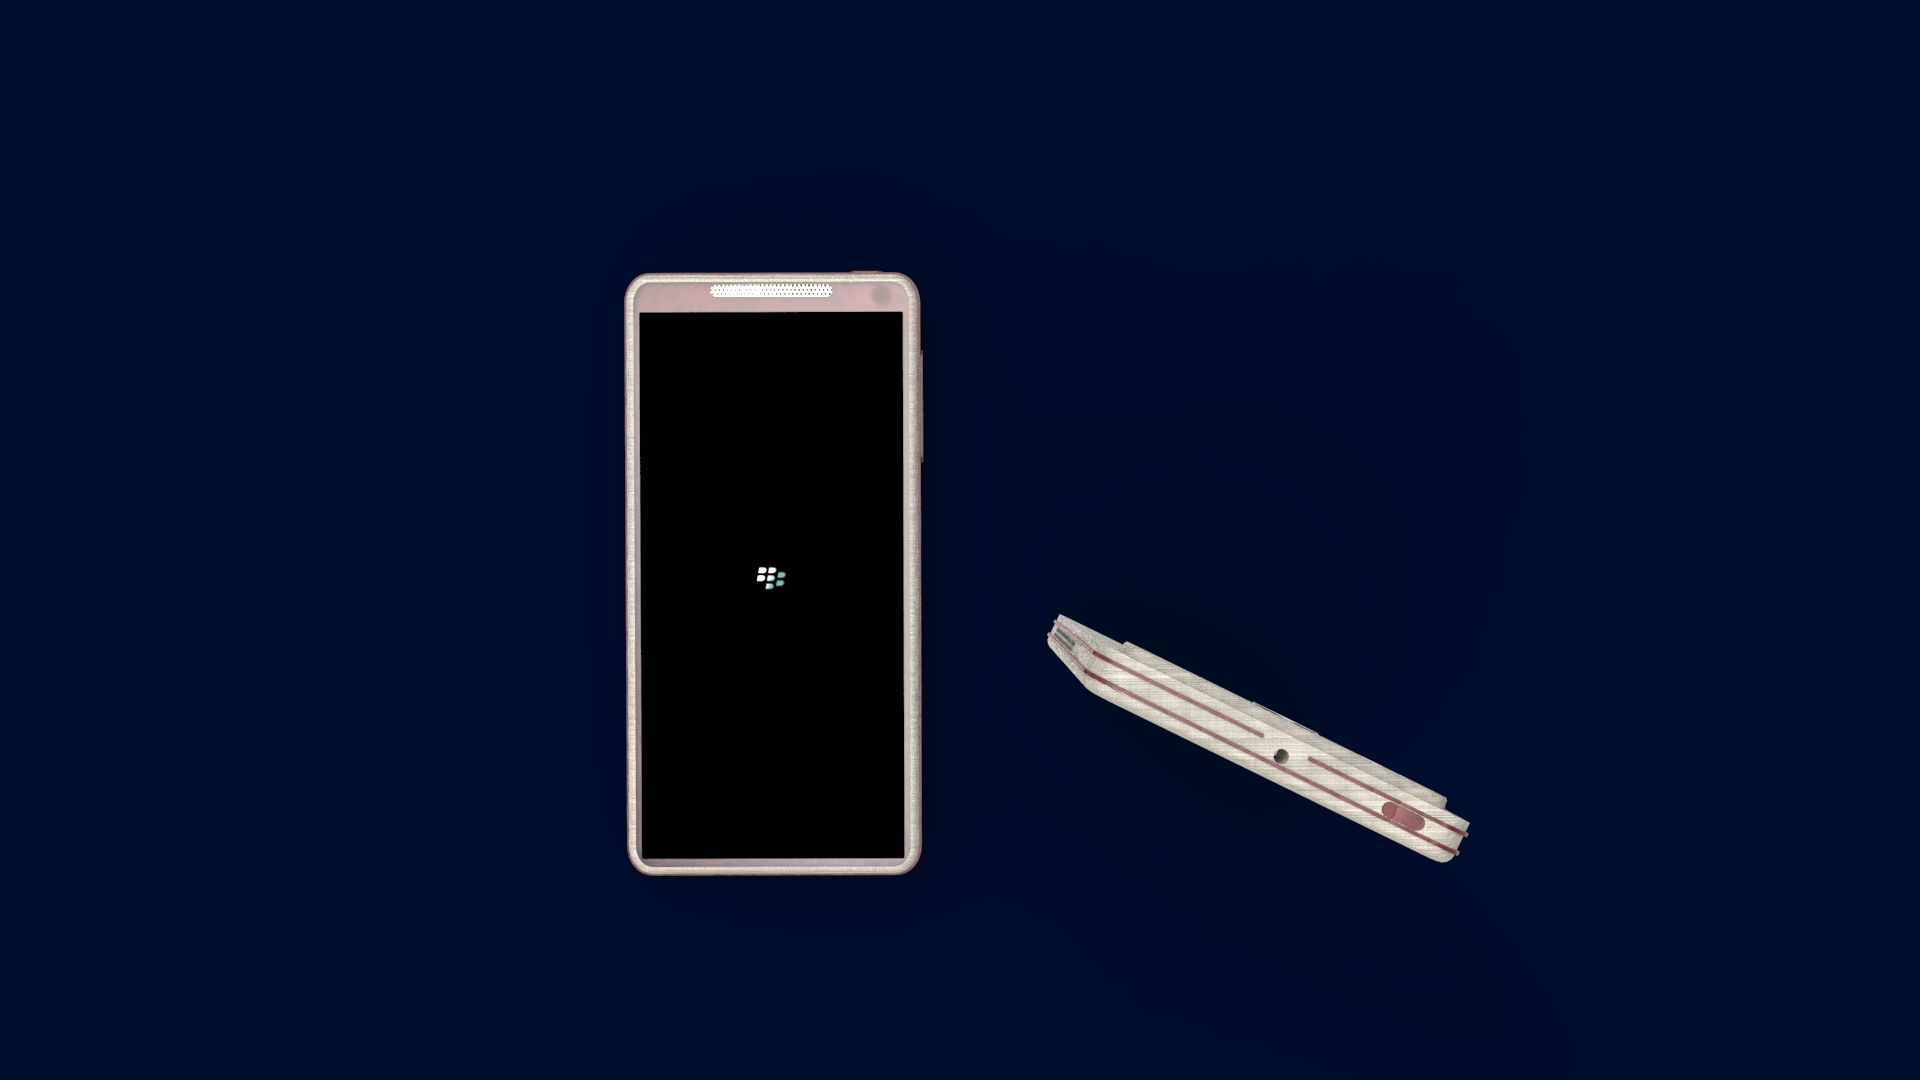 Bb-phone-45-3500-3500